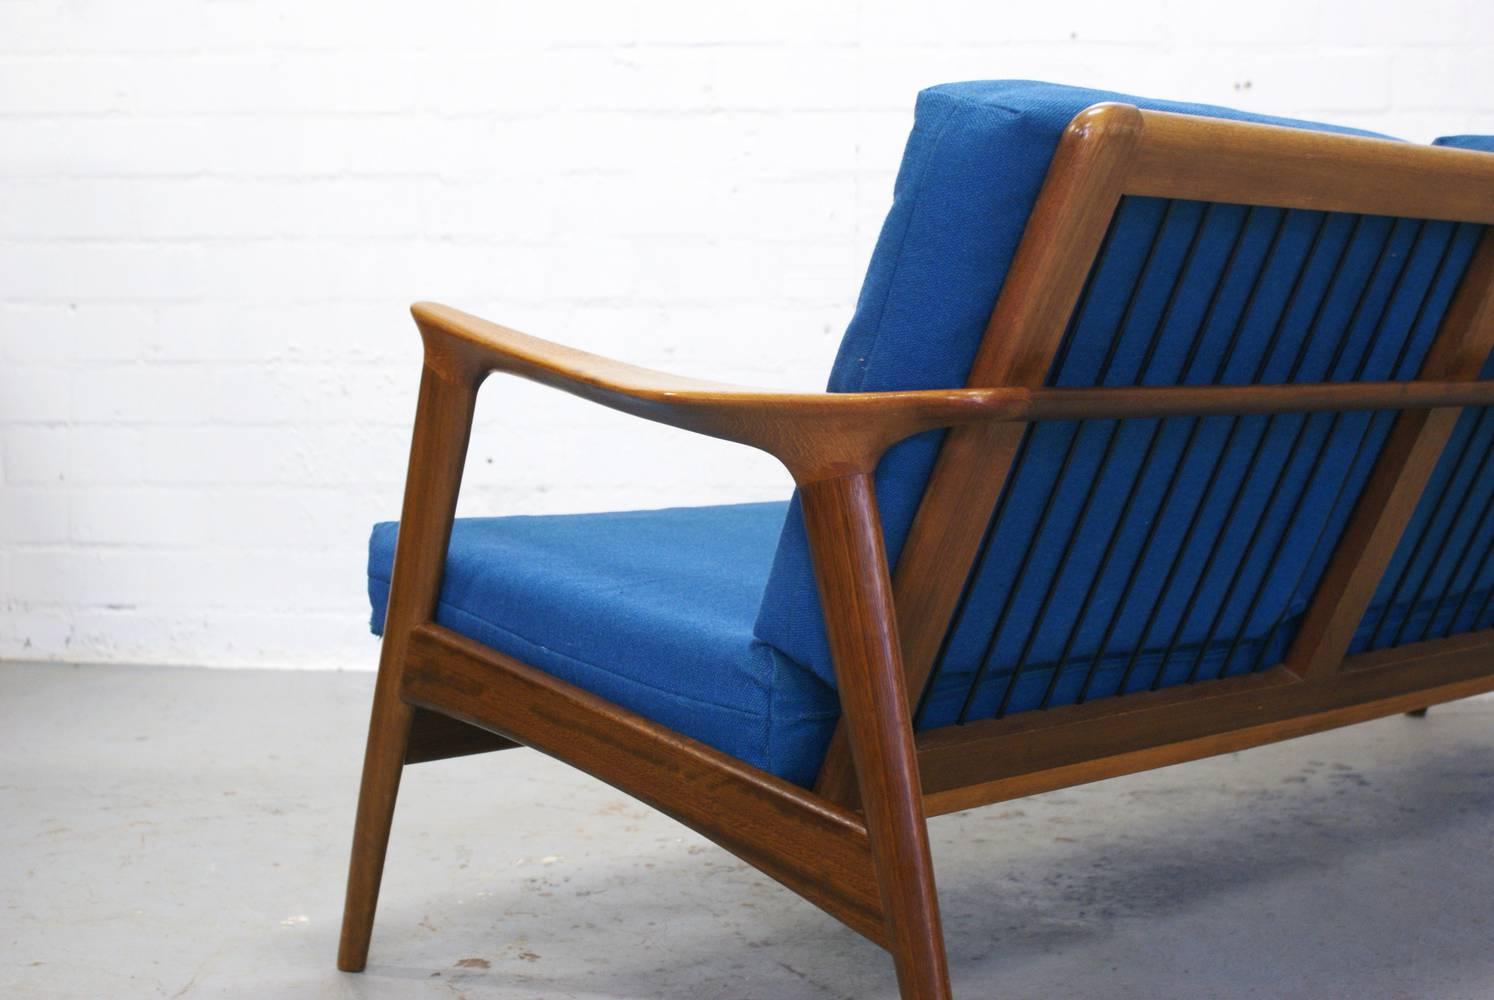 Retro Deens Design Leren Lounge Fauteuil Zetel Pictures